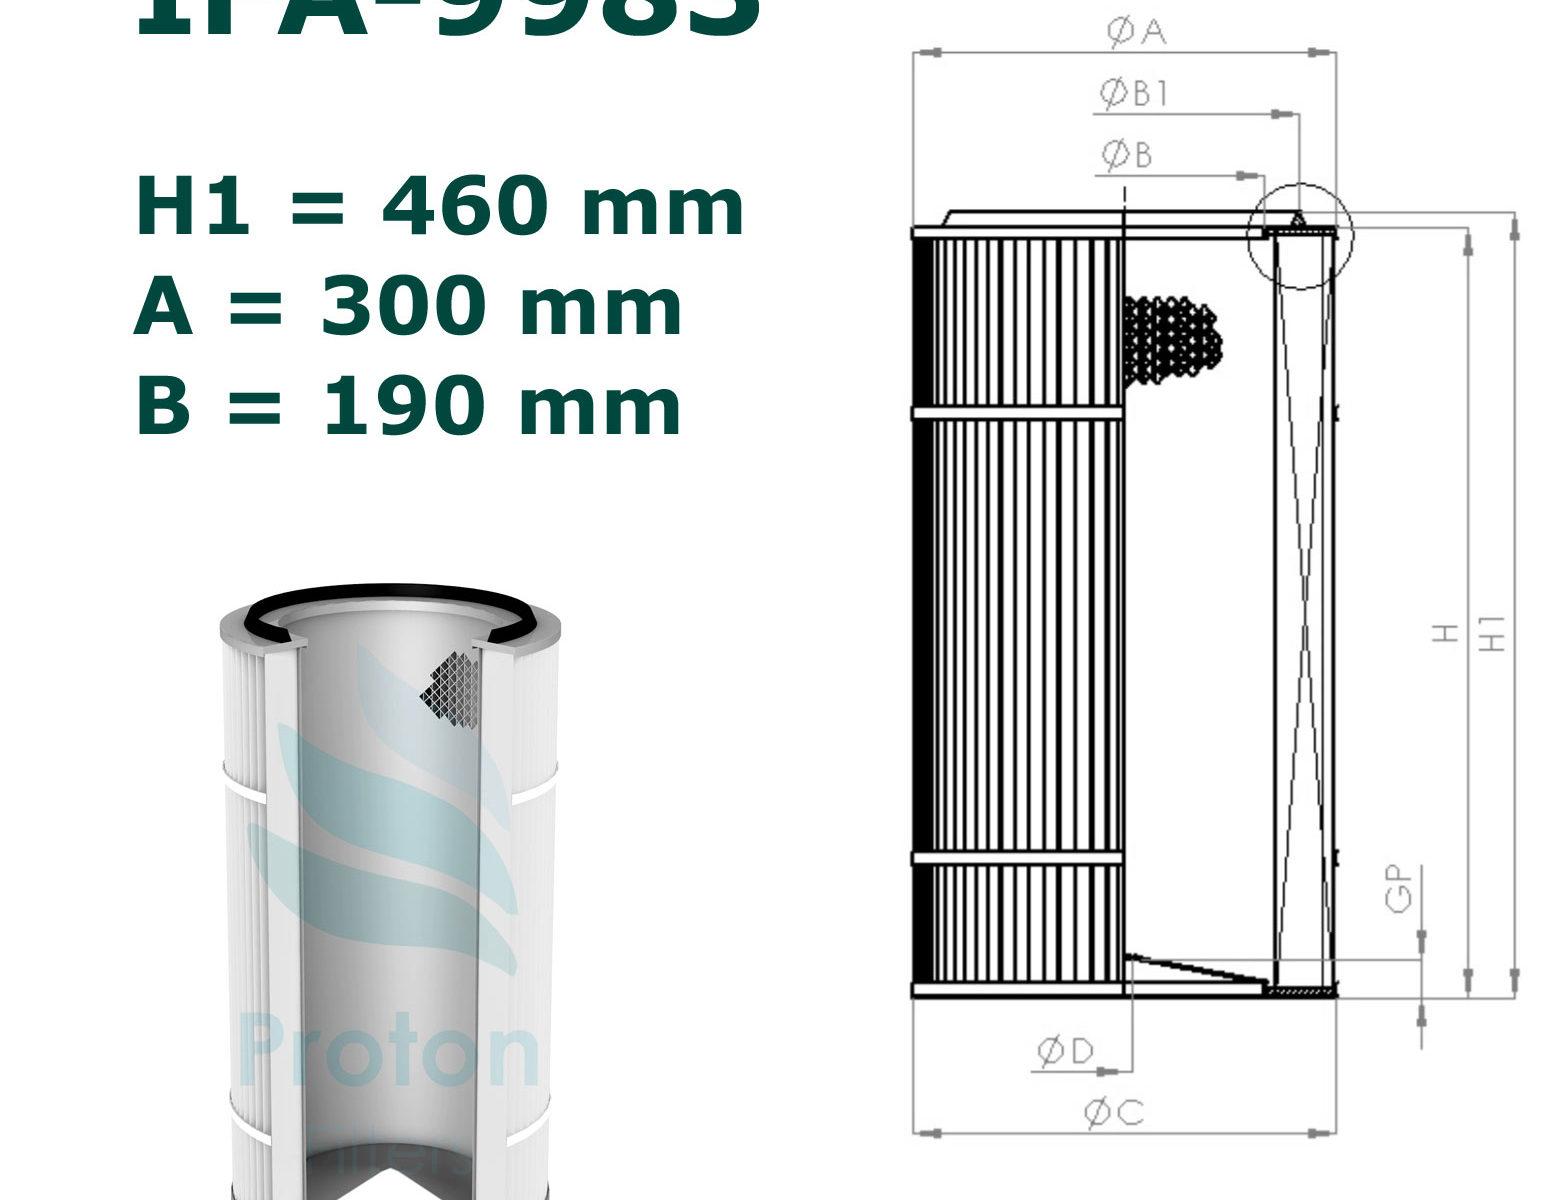 IFA-9983-1565x1200